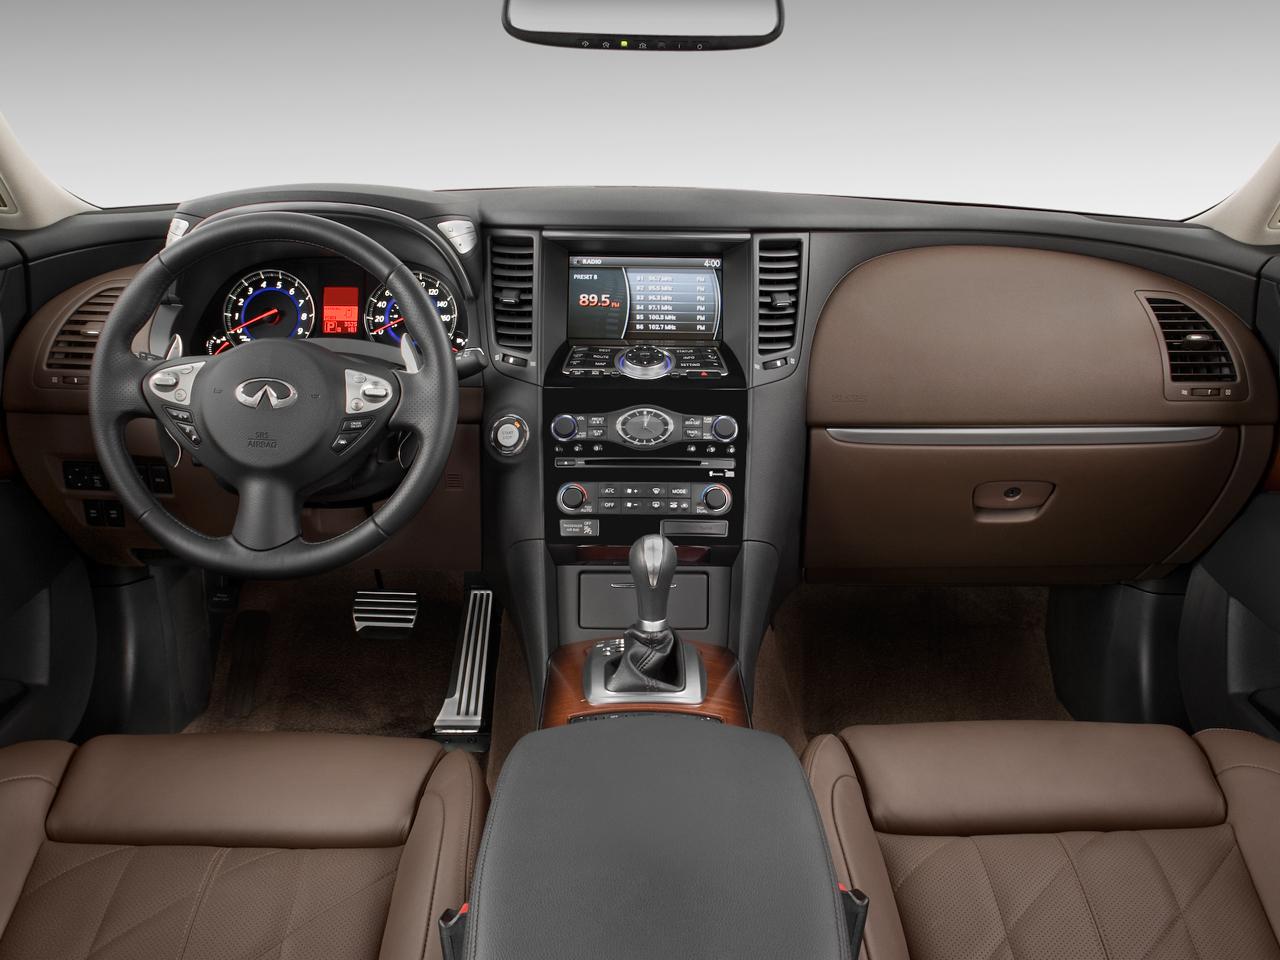 2009 infiniti fx35 latest news reviews and auto show coverage 3250 vanachro Choice Image